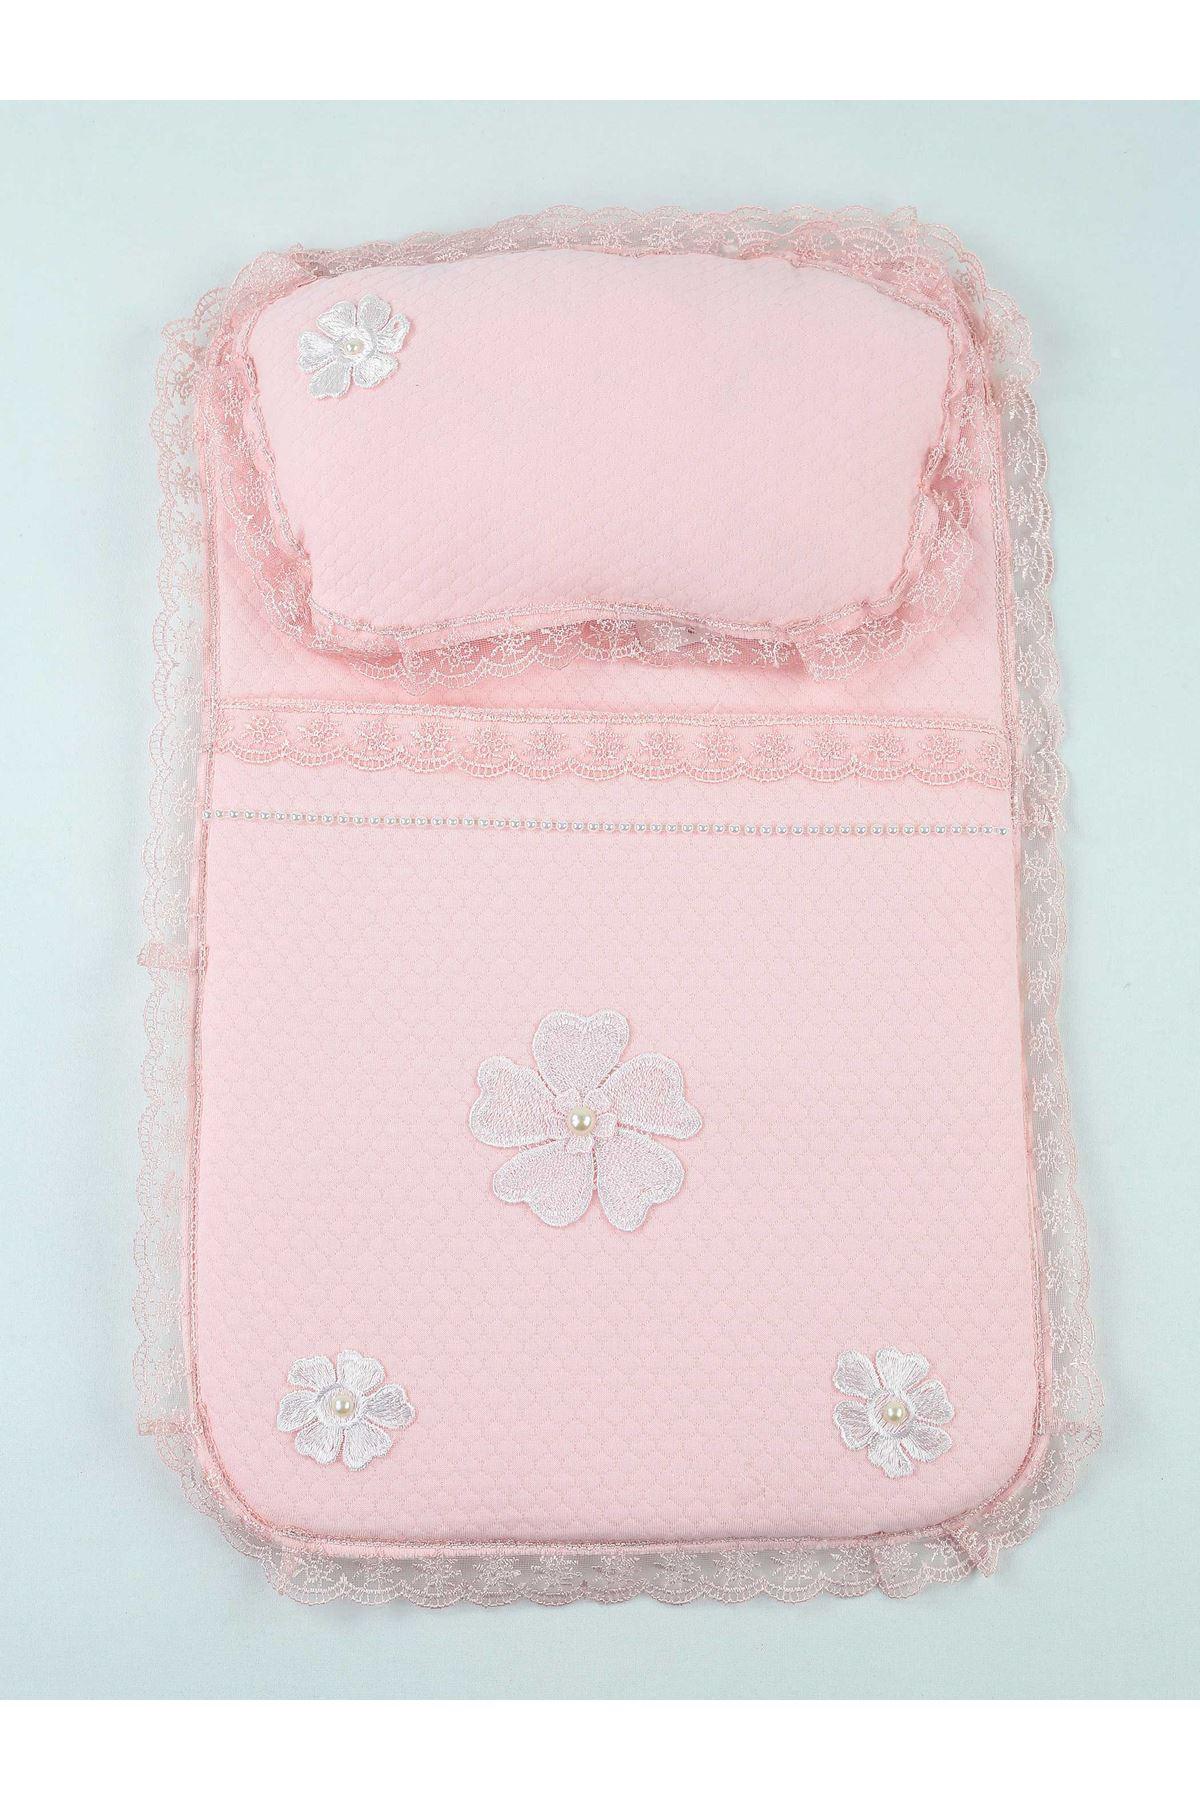 Pink Girl Baby Swaddle Bottom Opening